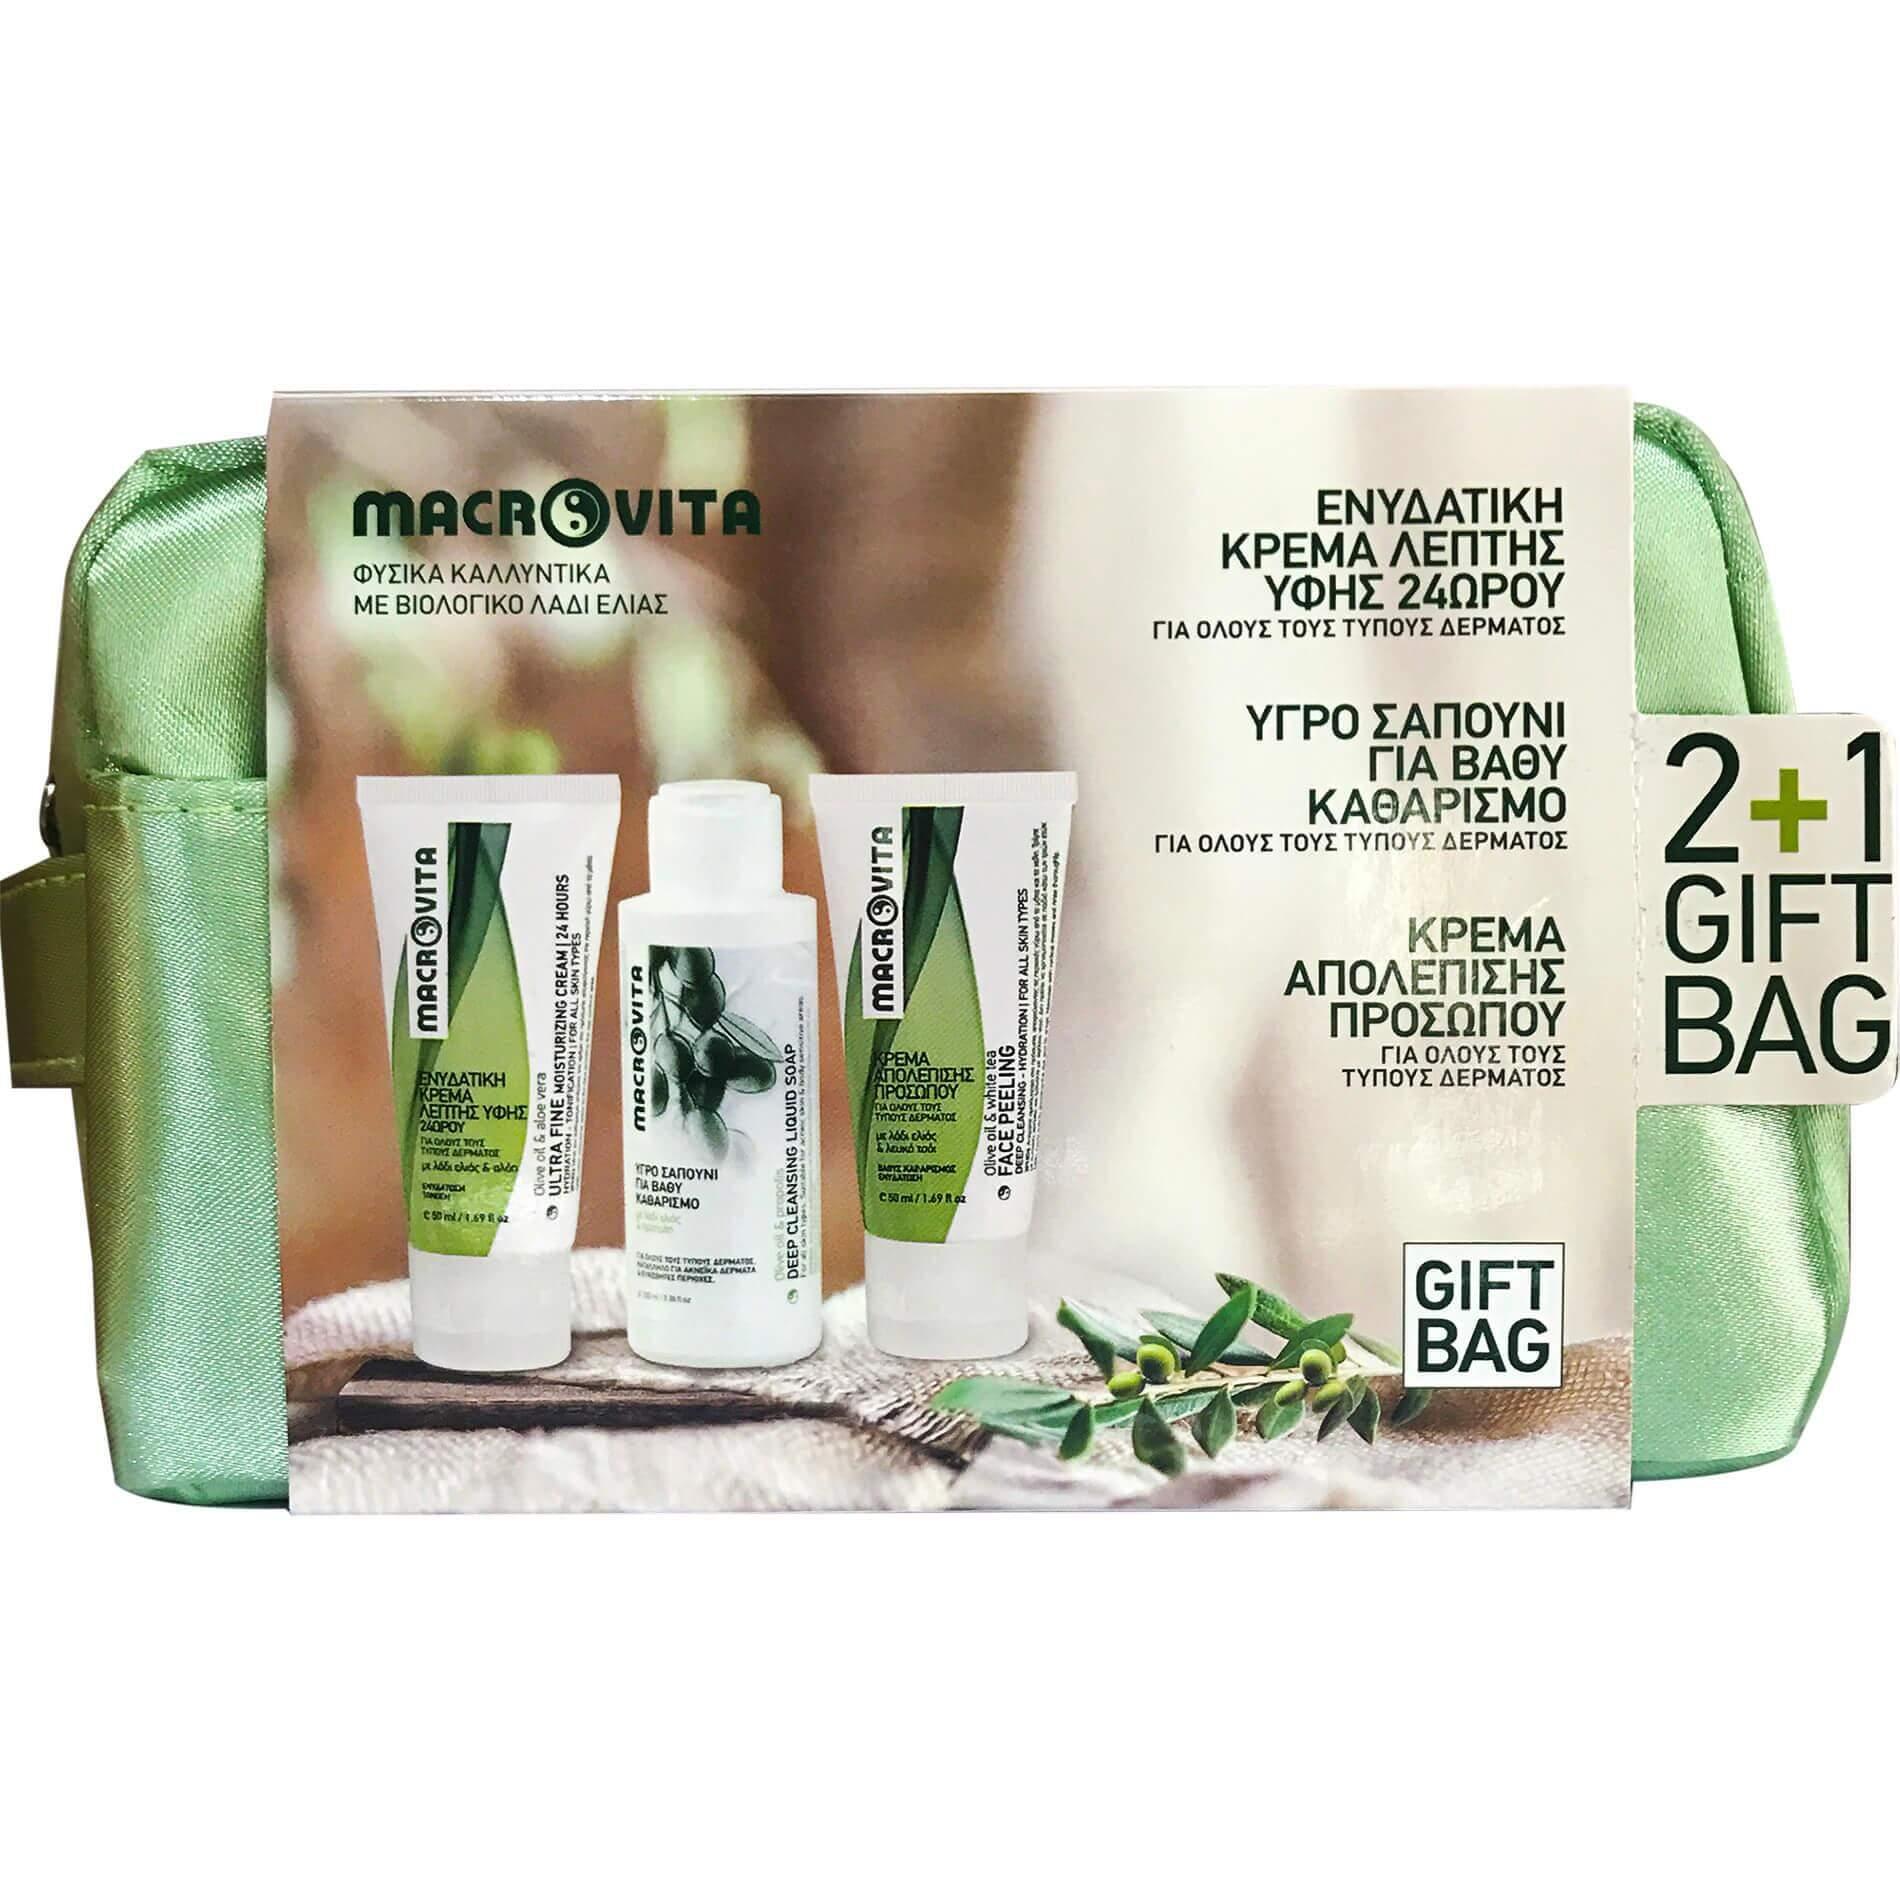 Macrovita Gift Bag Ενυδατική Κρέμα Λεπτής Υφής 50ml & Υγρό Σαπούνι για Βαθύ Καθαρισμό 100ml & Κρέμα Απολέπισης Προσώπου 50ml